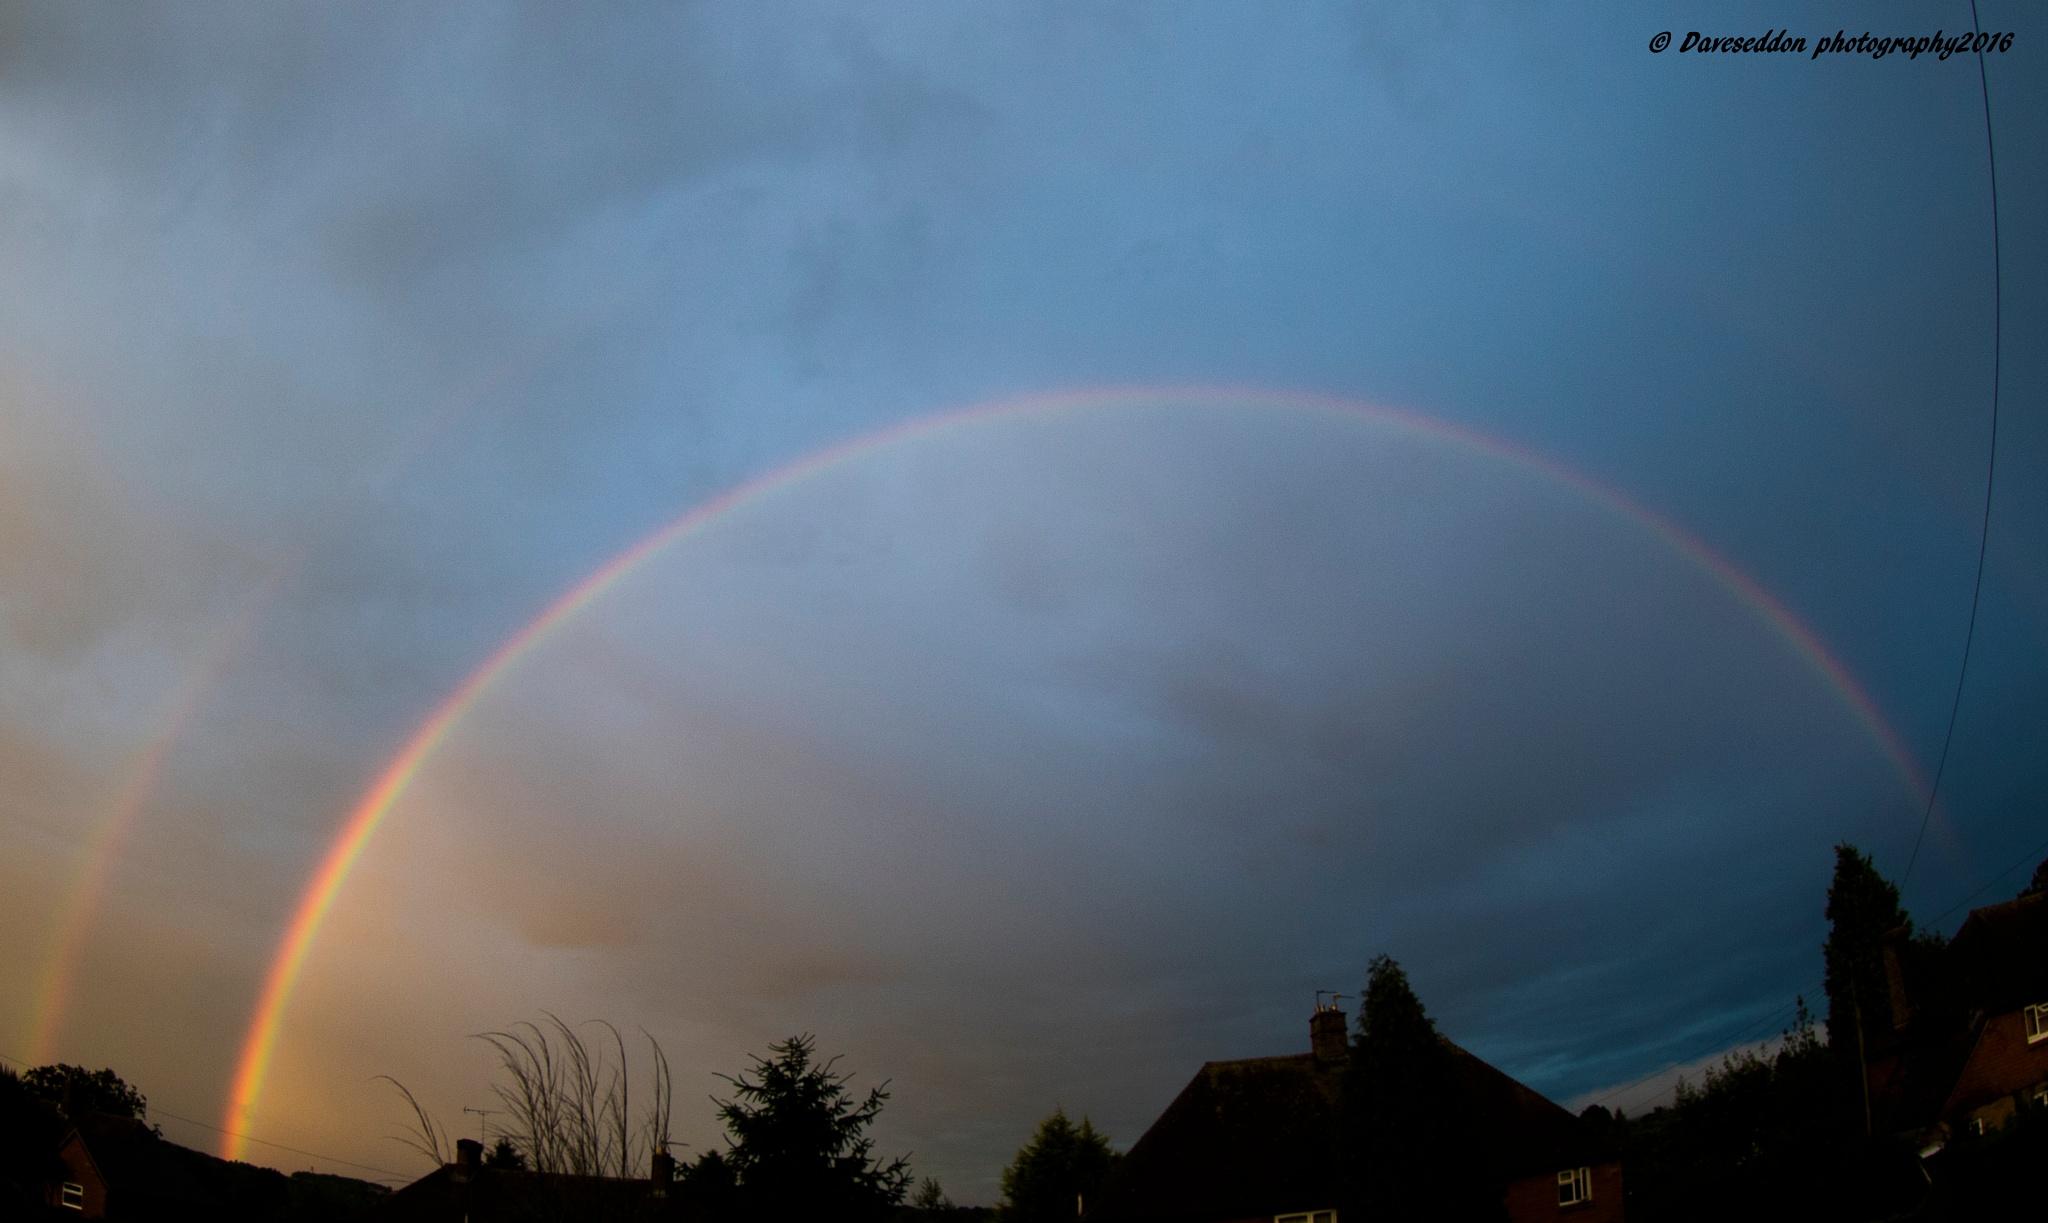 Sunset and rainbow by DaveSeddon